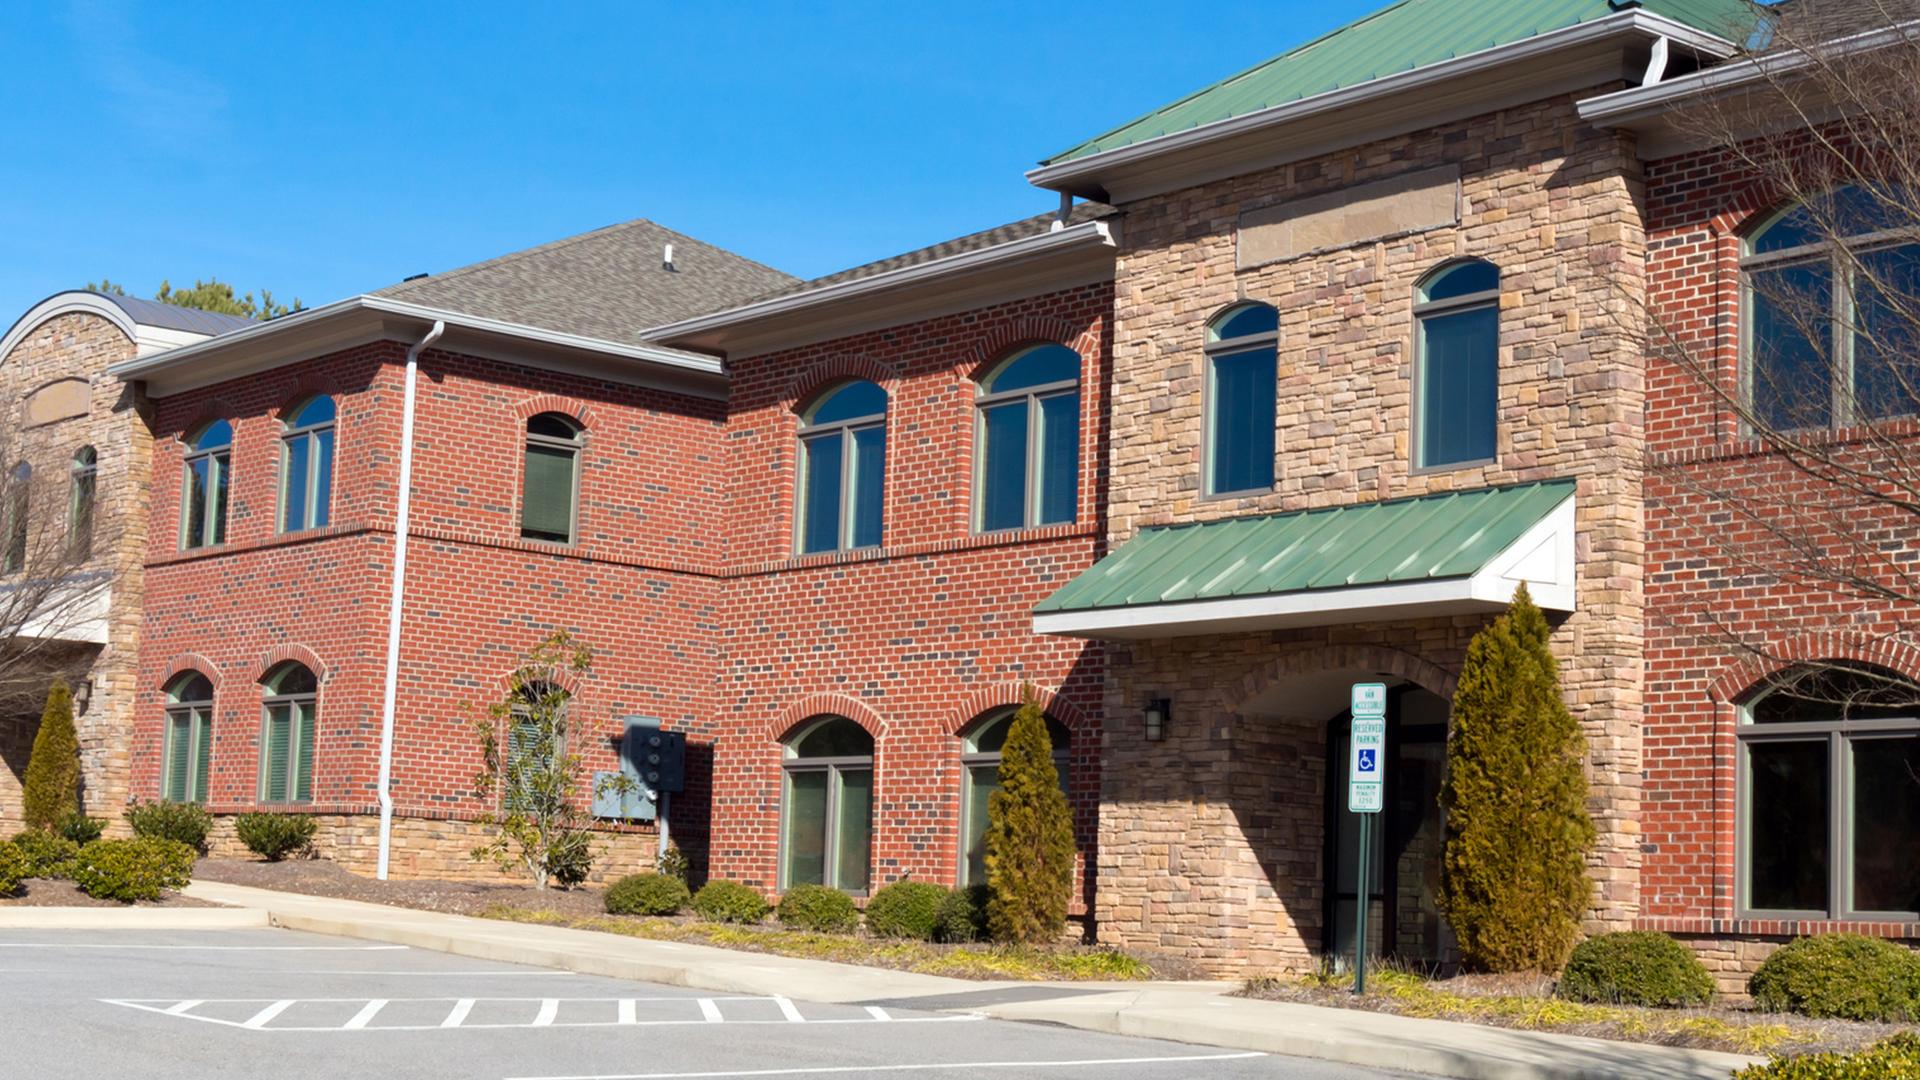 Commercial Property Client & Tenant Communication